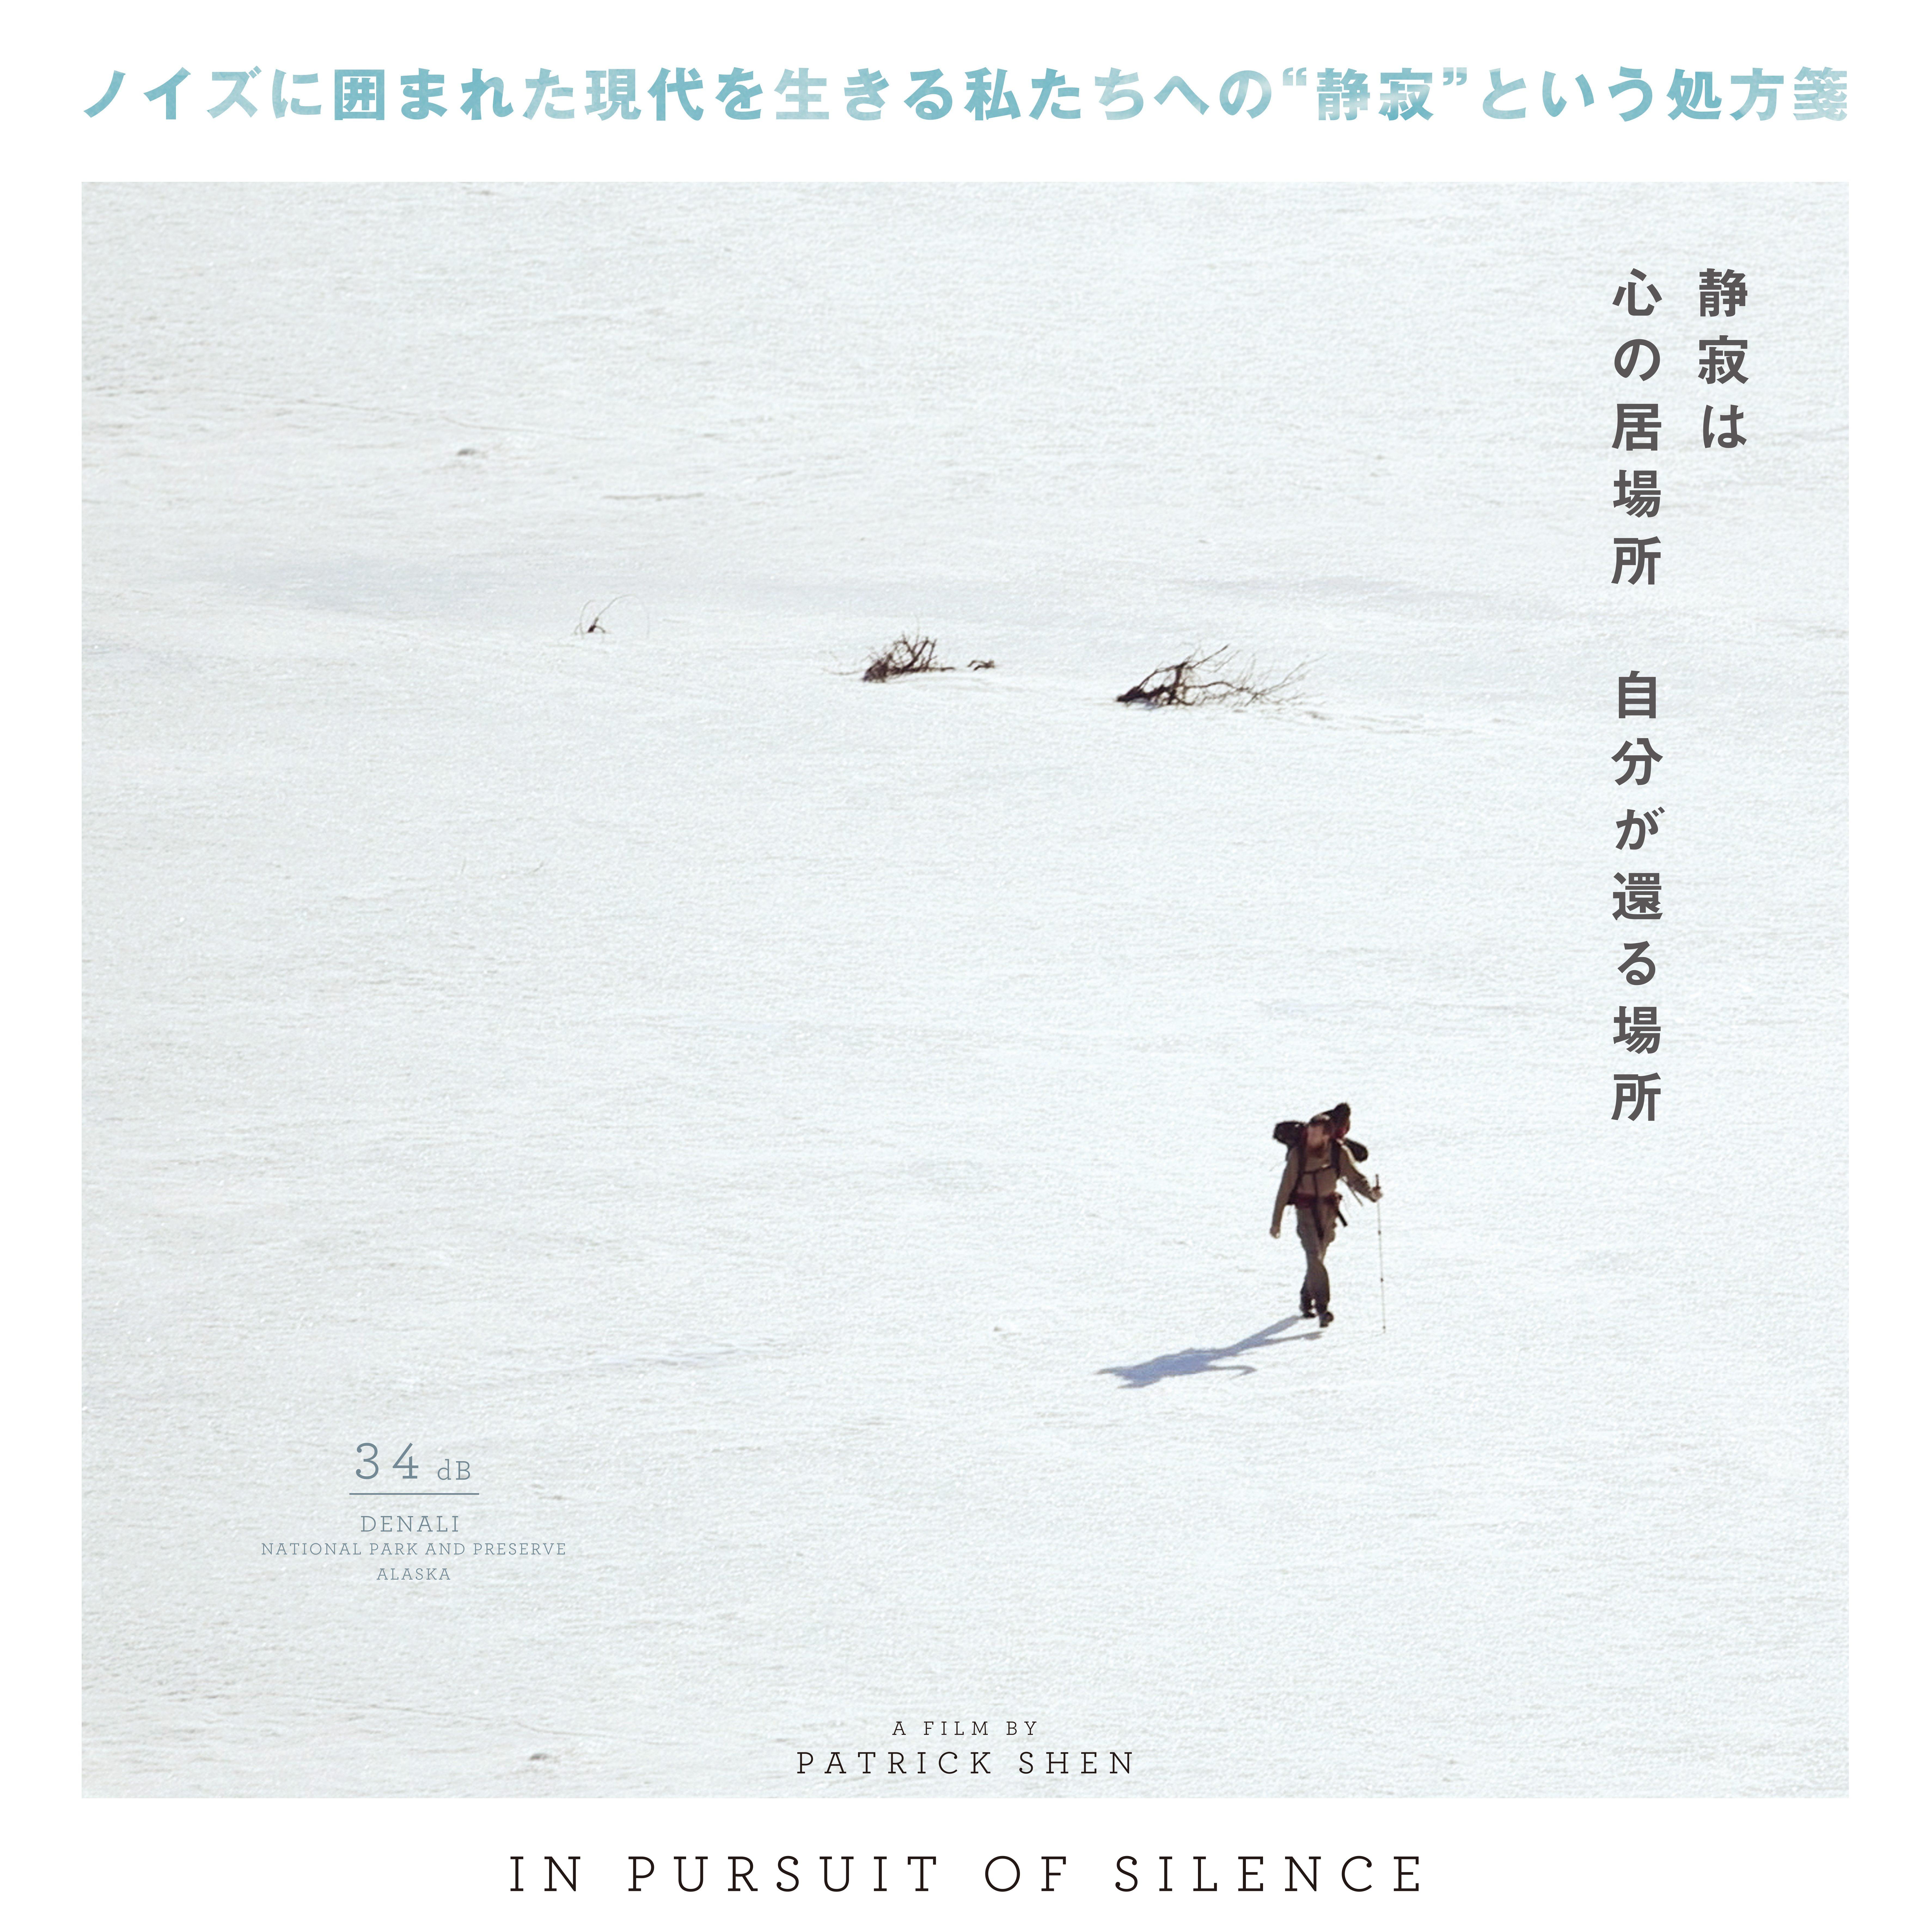 mumokuteki cinema vol.9 🎬『静寂を求めて −癒やしのサイレンス−』 上映+「禅とは何か」お話と坐禅のワークショップ